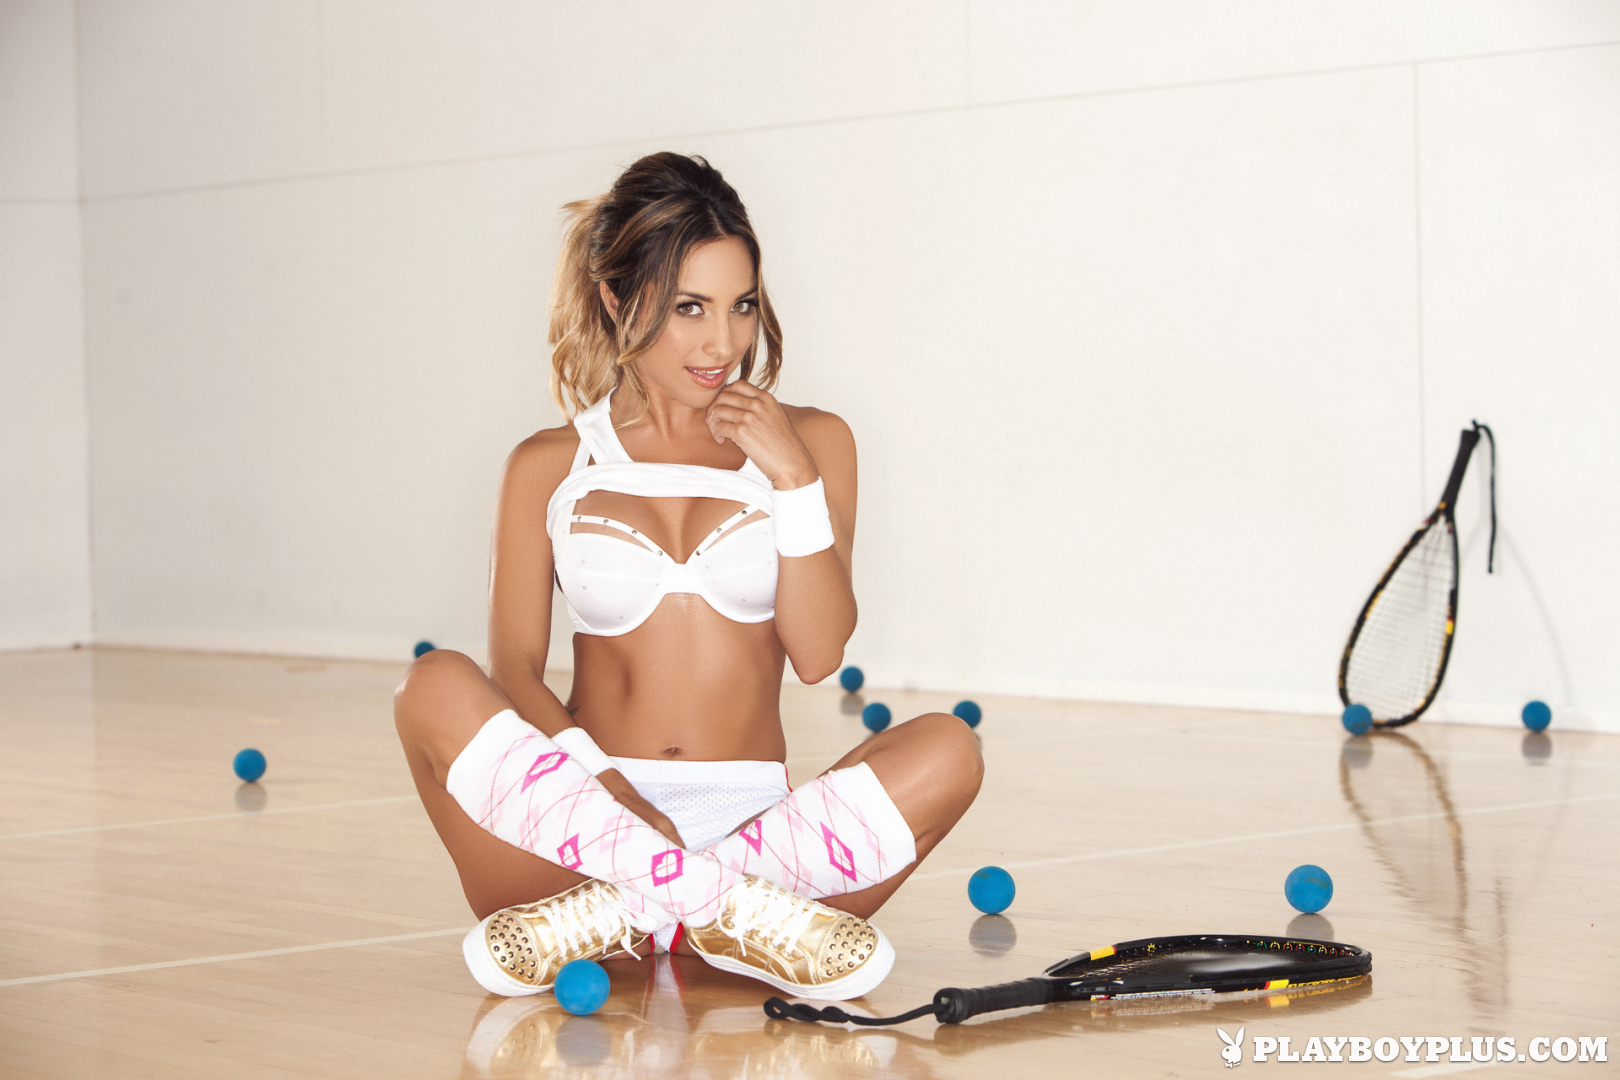 Playboy Cybergirl - Yesenia Bustillo Nude Photos & Videos at Playboy Plus!